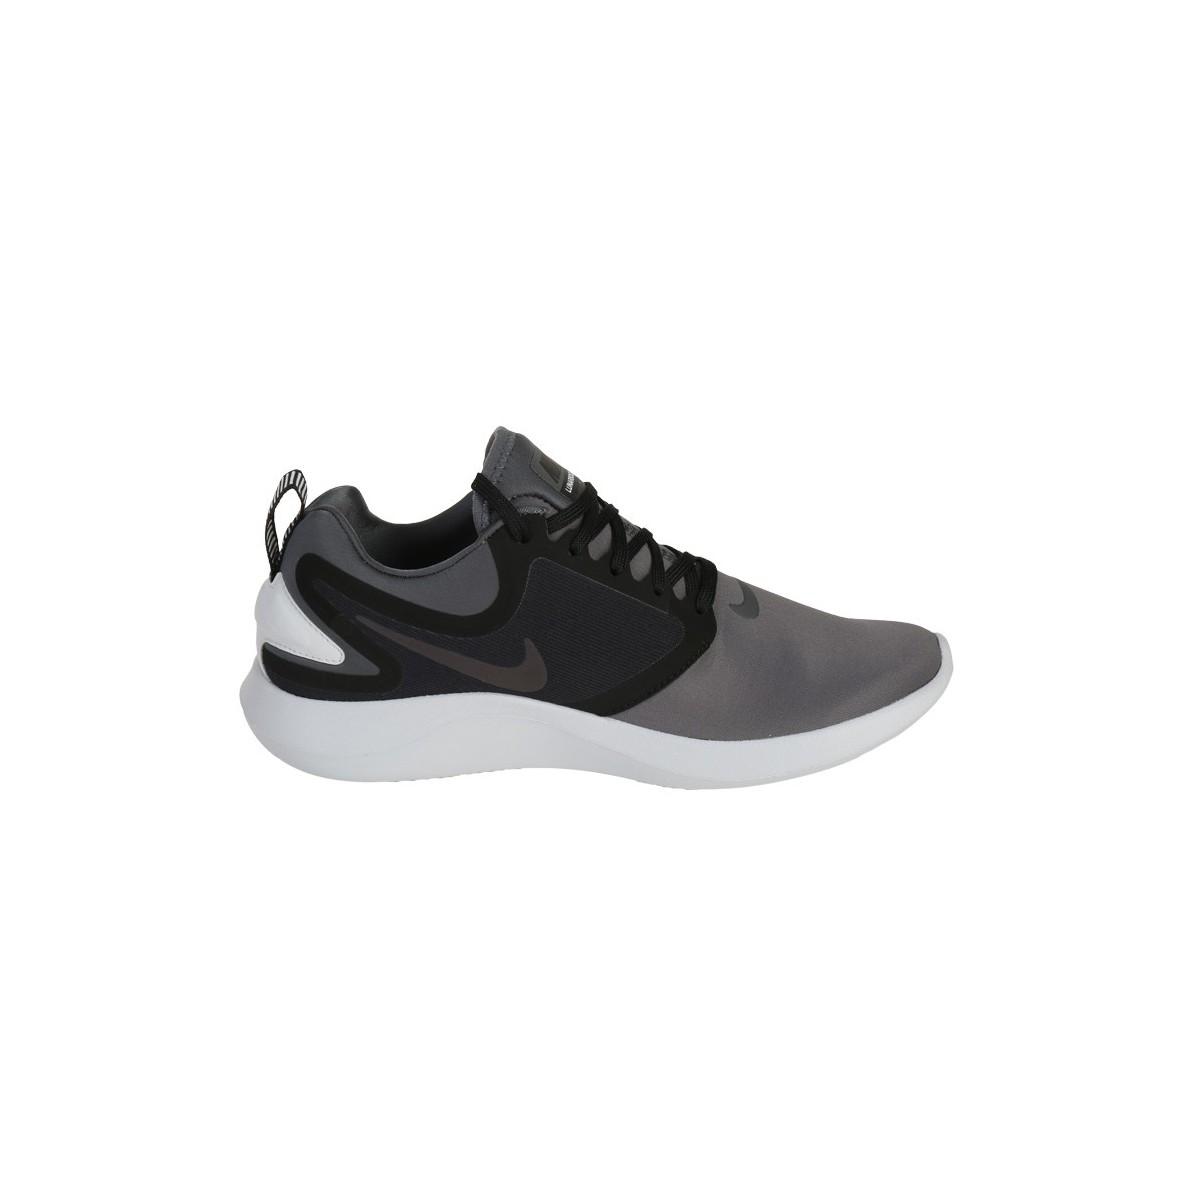 1c768c3e0727c NIKE LUNARSOLO   Zapatillas Hombre Nike LunarSolo Gris  AA4079 012 ...